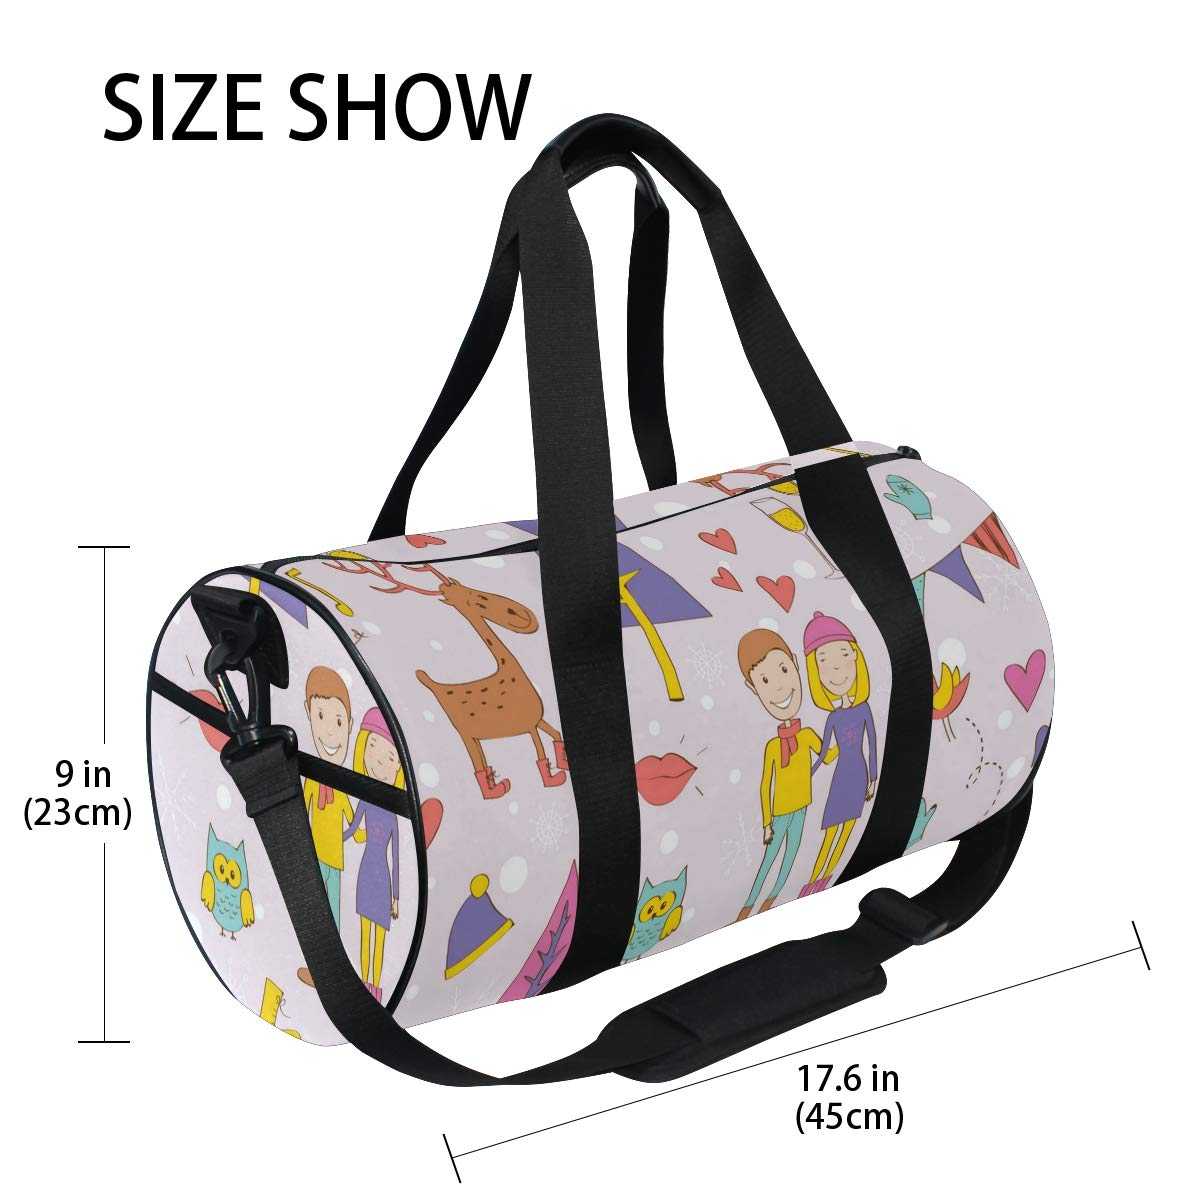 Zen Music CD ImageWaterproof Non-Slip Wearable Crossbody Bag fitness bag Shoulder Bag